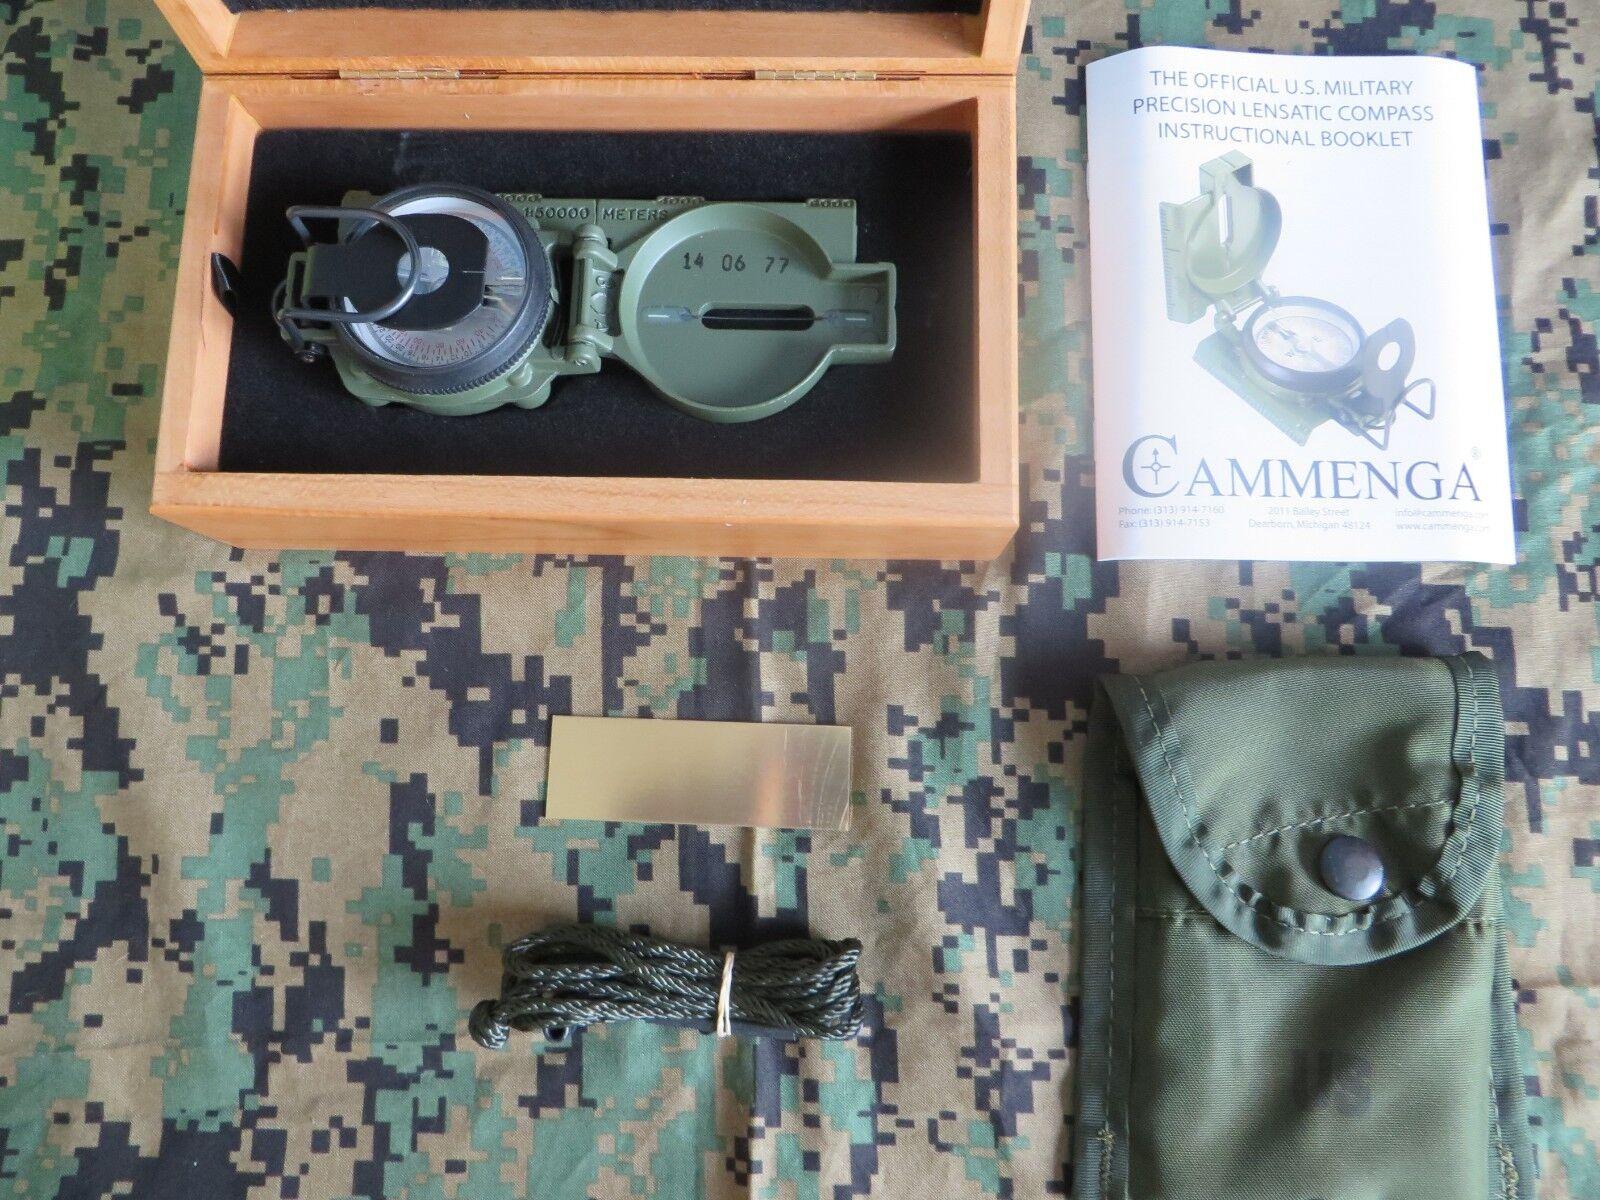 COLLECTIBLE CAMMENGA 3H  LENSATIC TRITIUM COMPASS + CHERRYWOOD DISPLAY BOX  deals sale